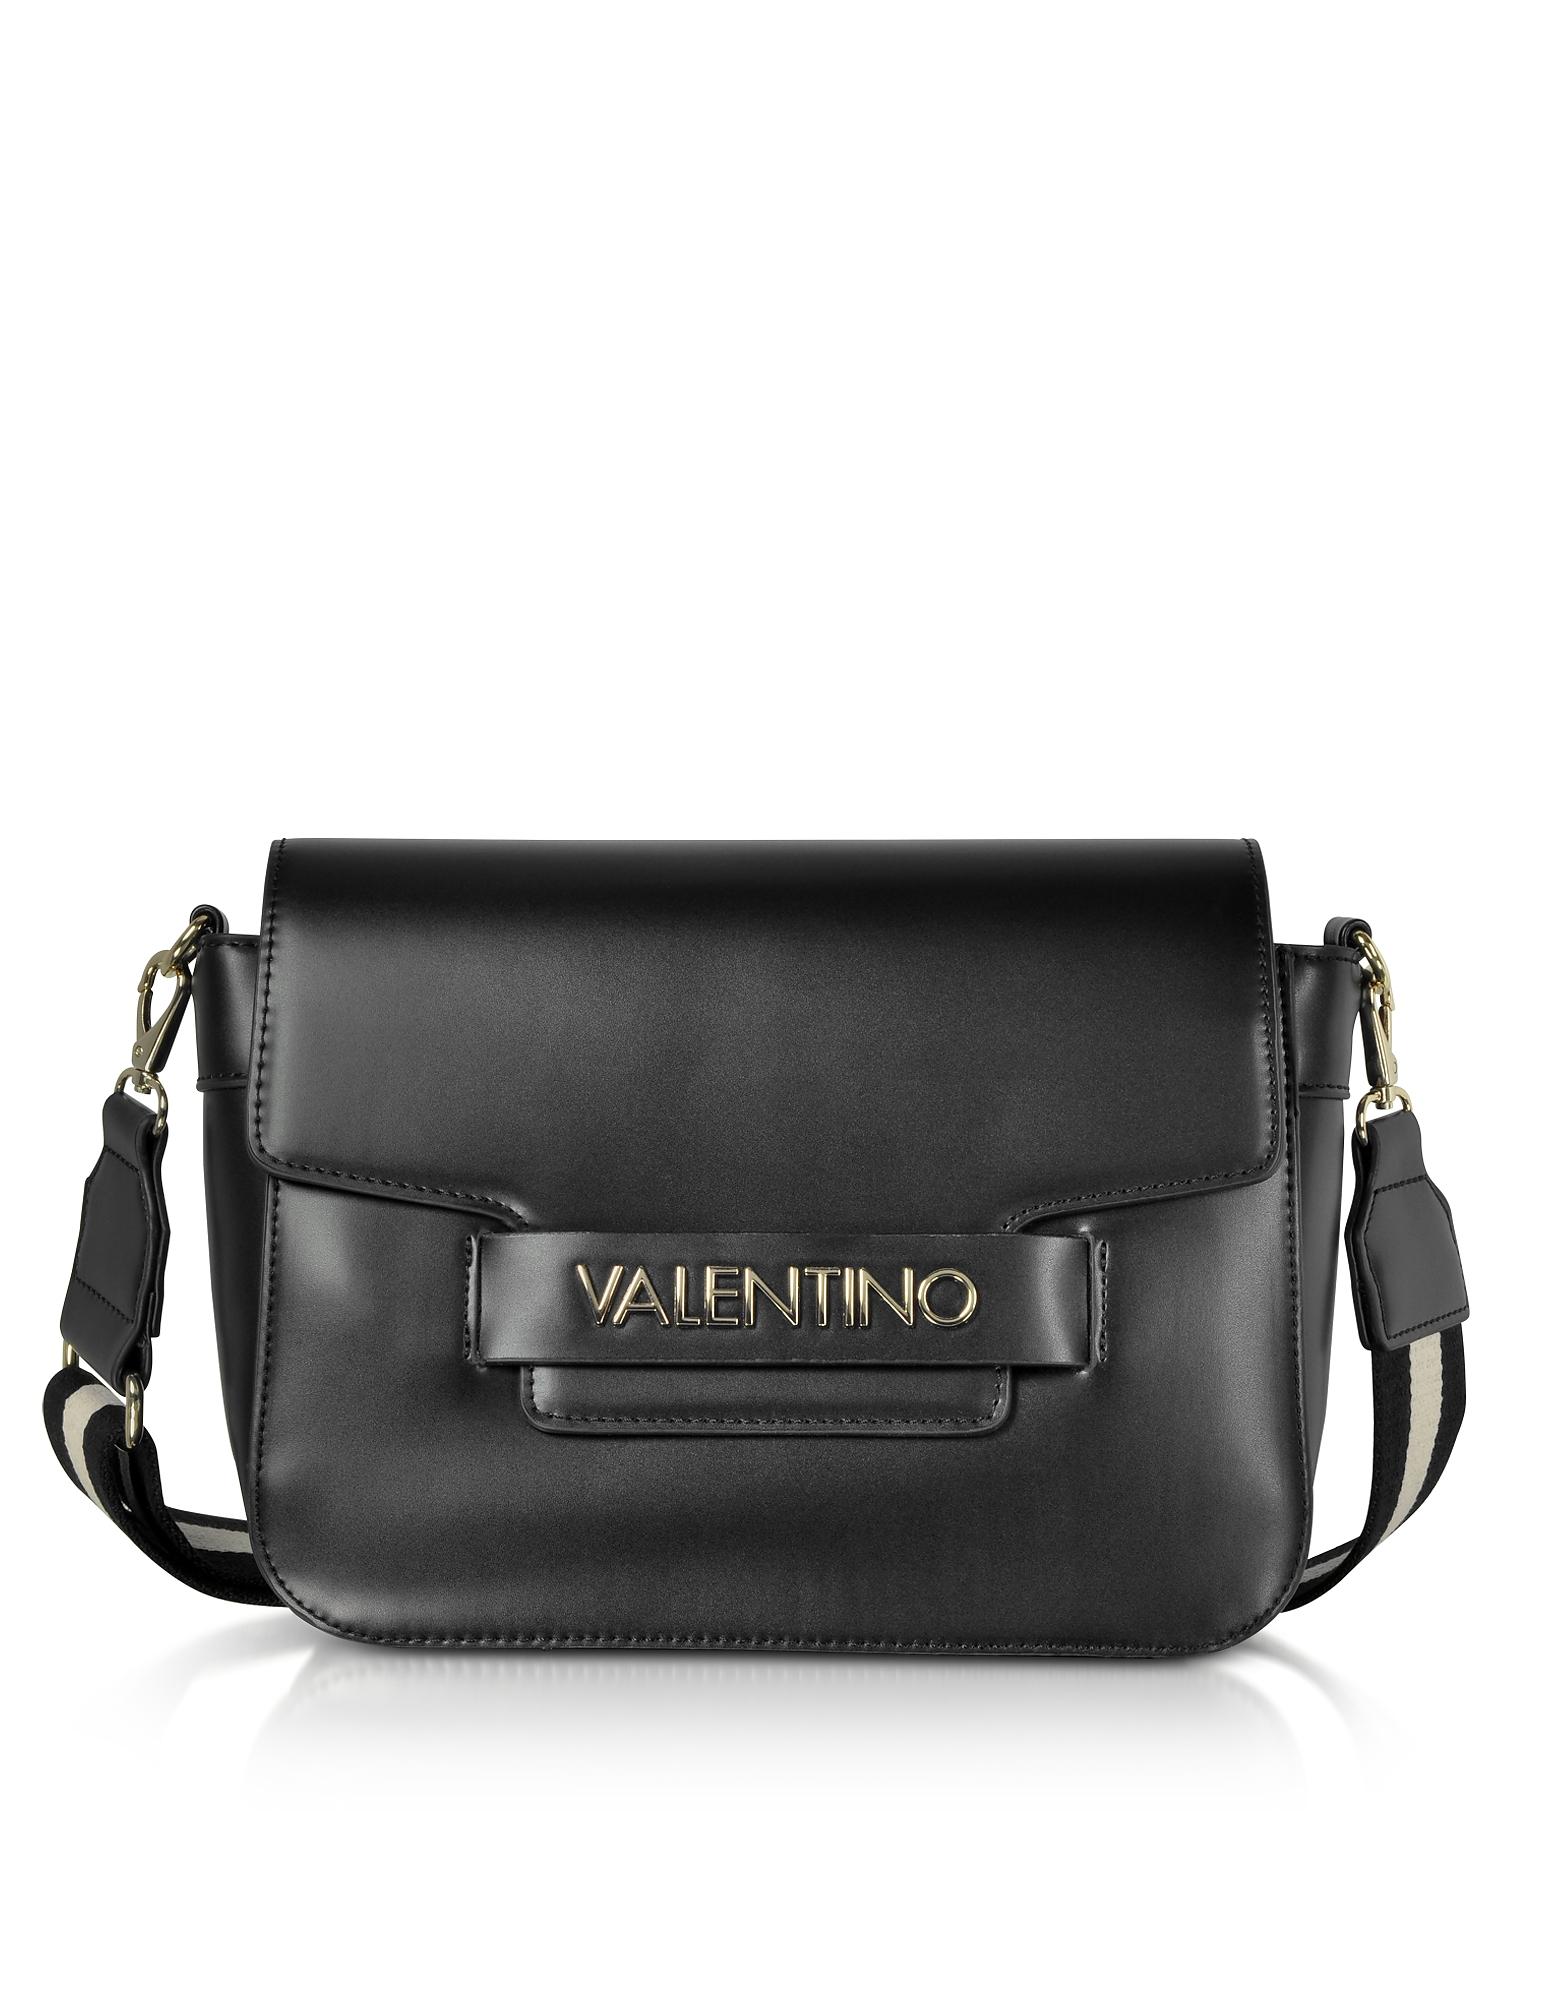 Image of Valentino by Mario Valentino Designer Handbags, Eco Leather Blast Shoulder Bag w/Canvas Strap